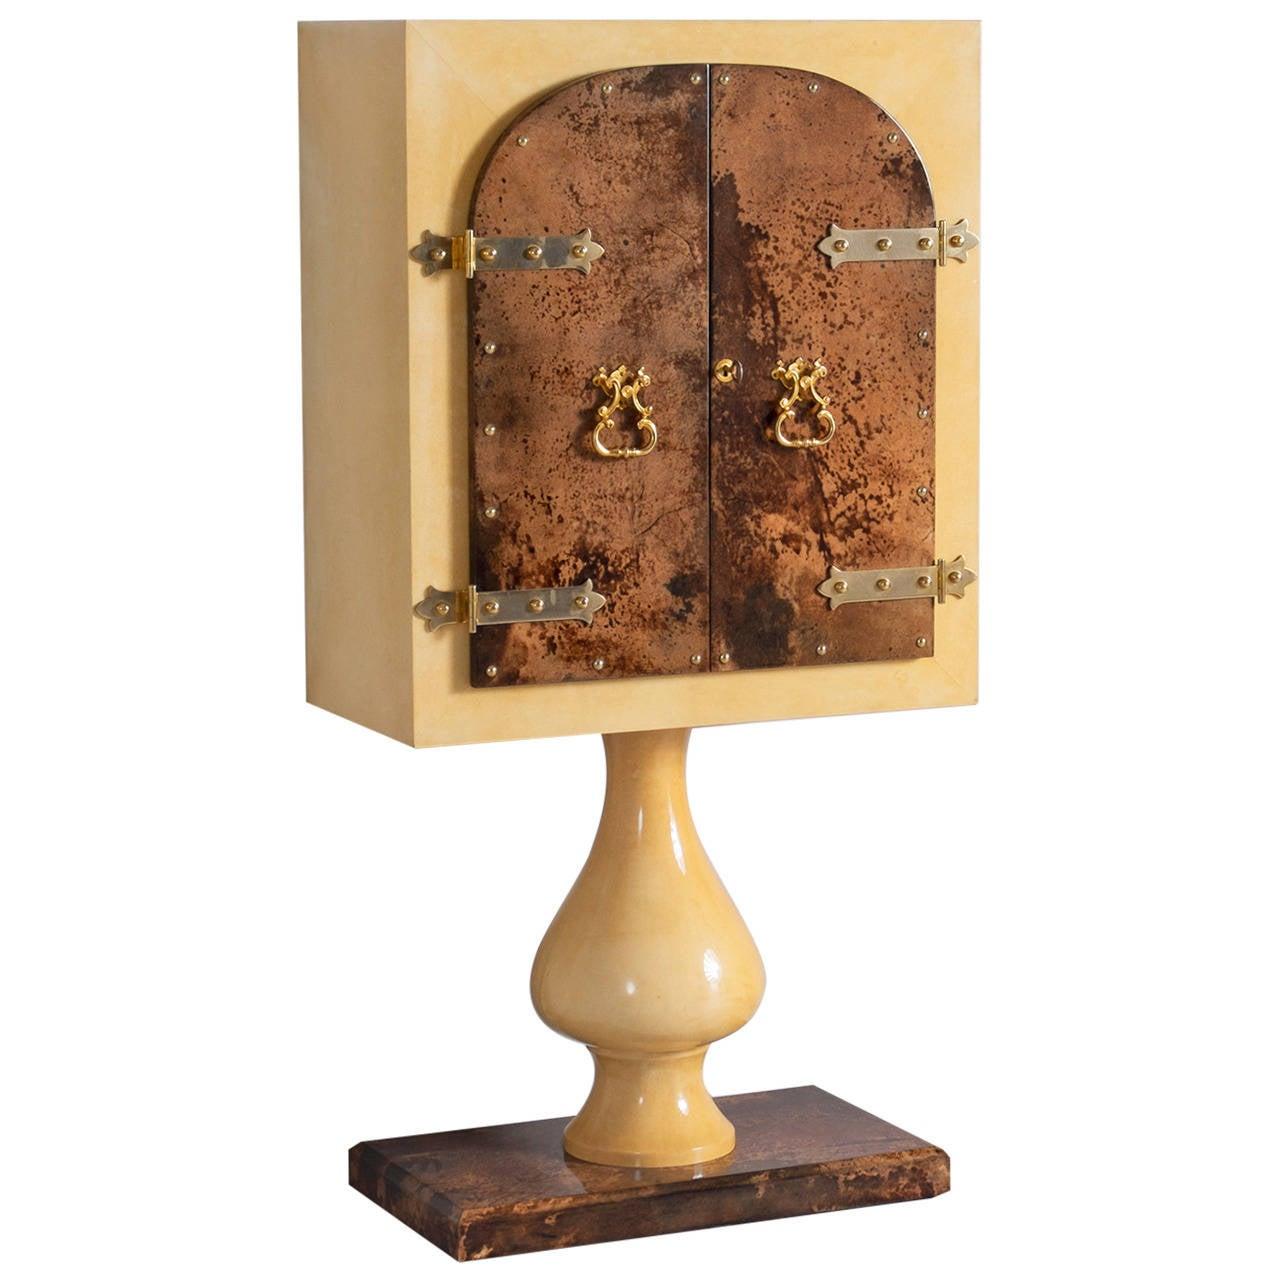 Aldo Tura Lacquered Goatskin Pedestal Bar Cabinet